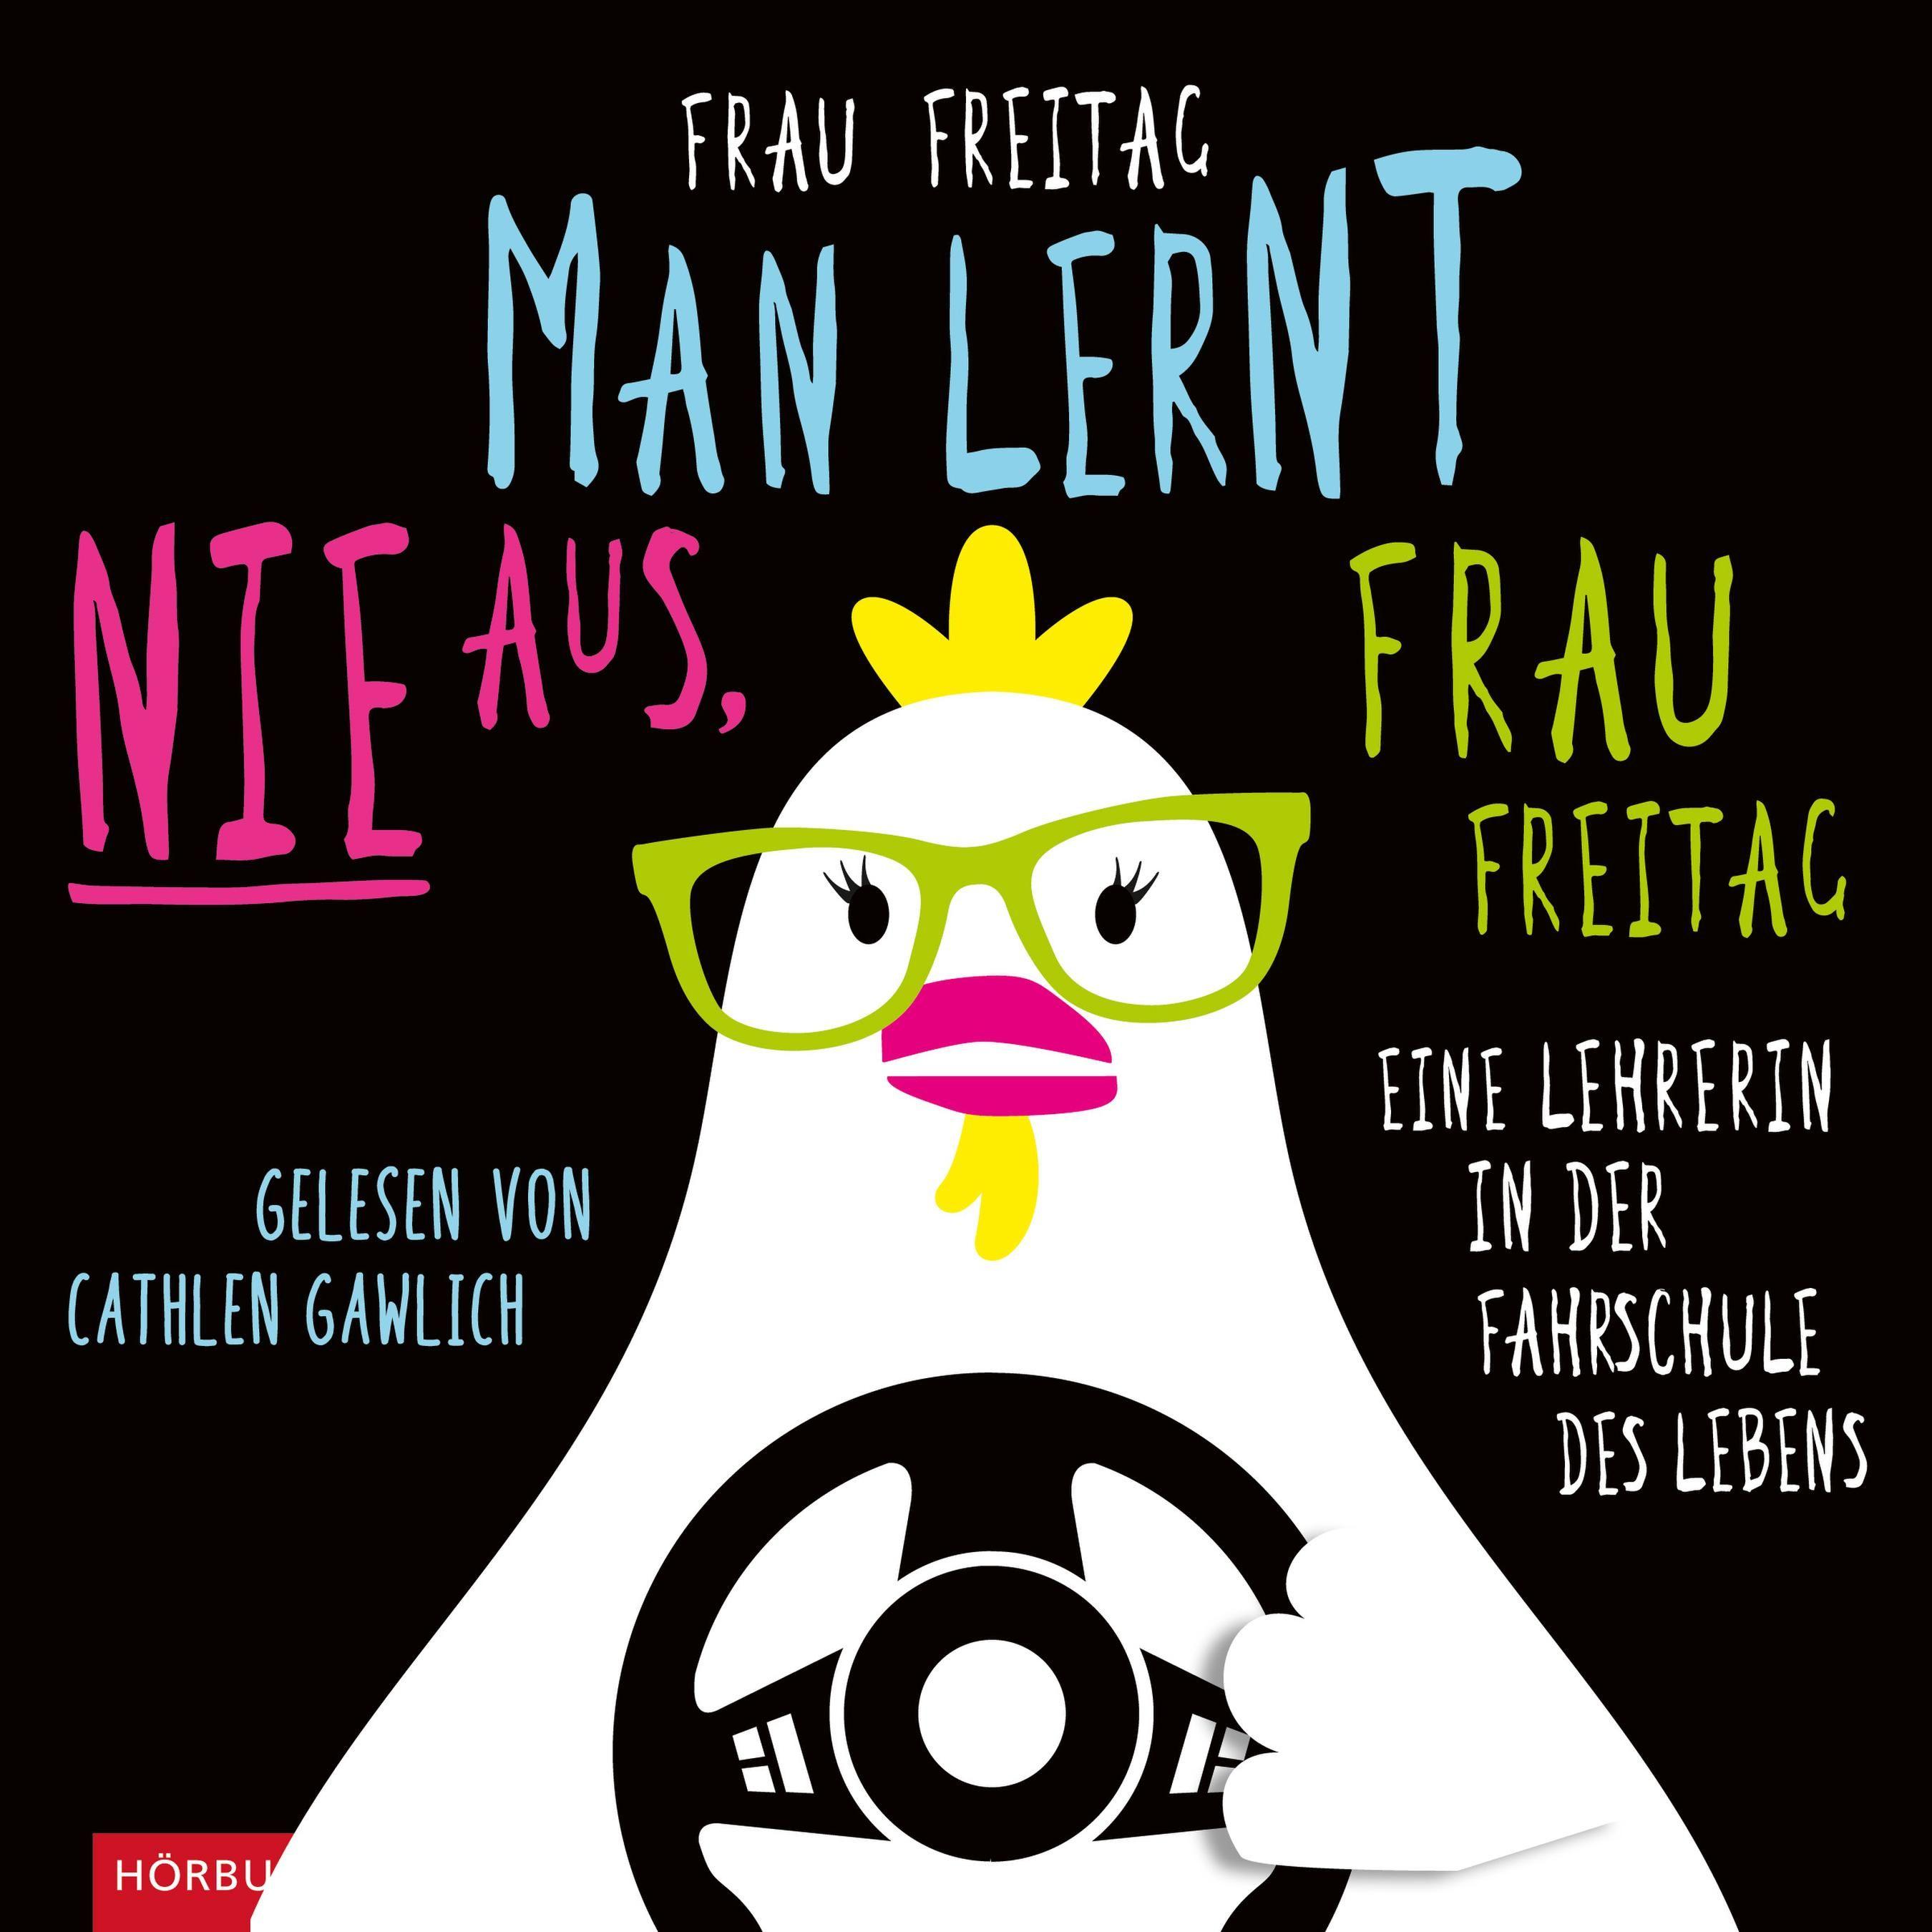 Cover für das Man lernt nie aus, Frau Freitag! Hörbuch